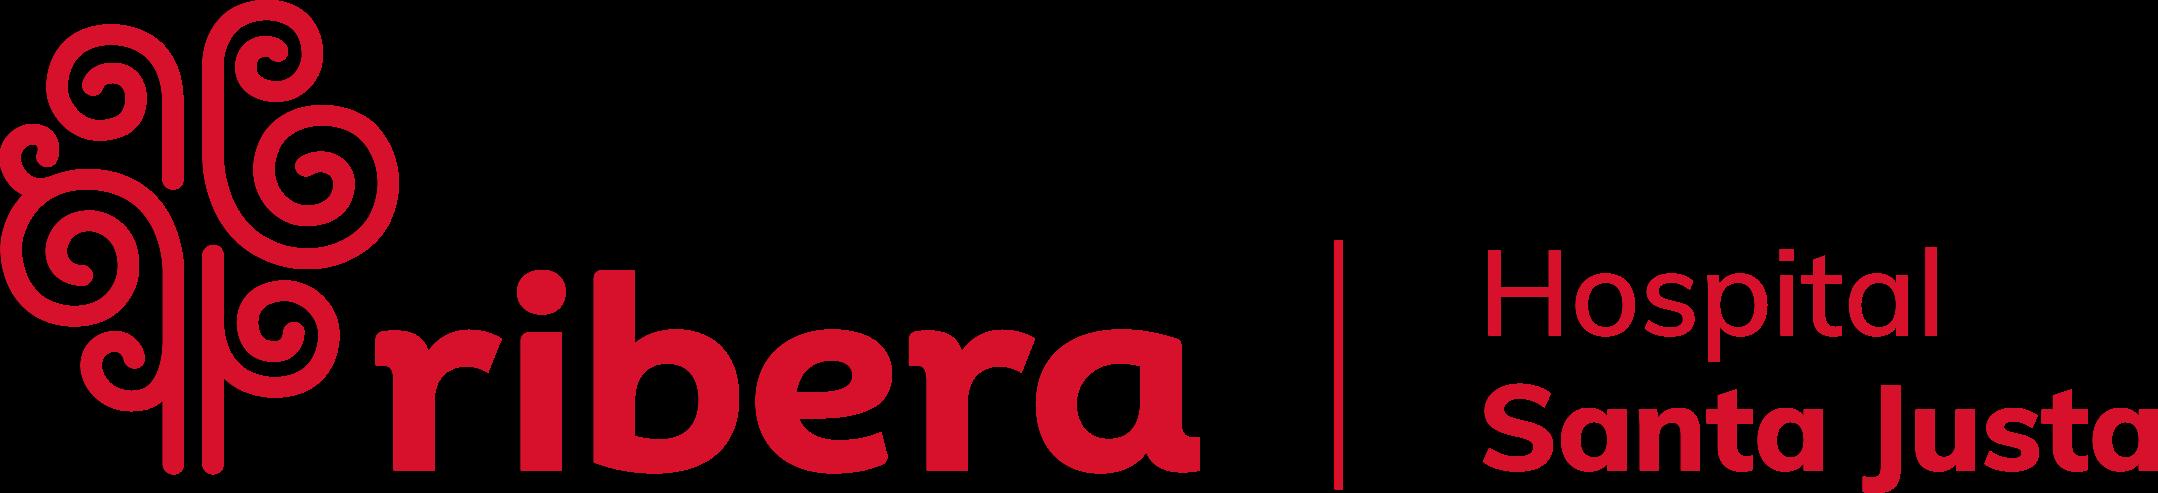 Hospital Ribera Santa Justa